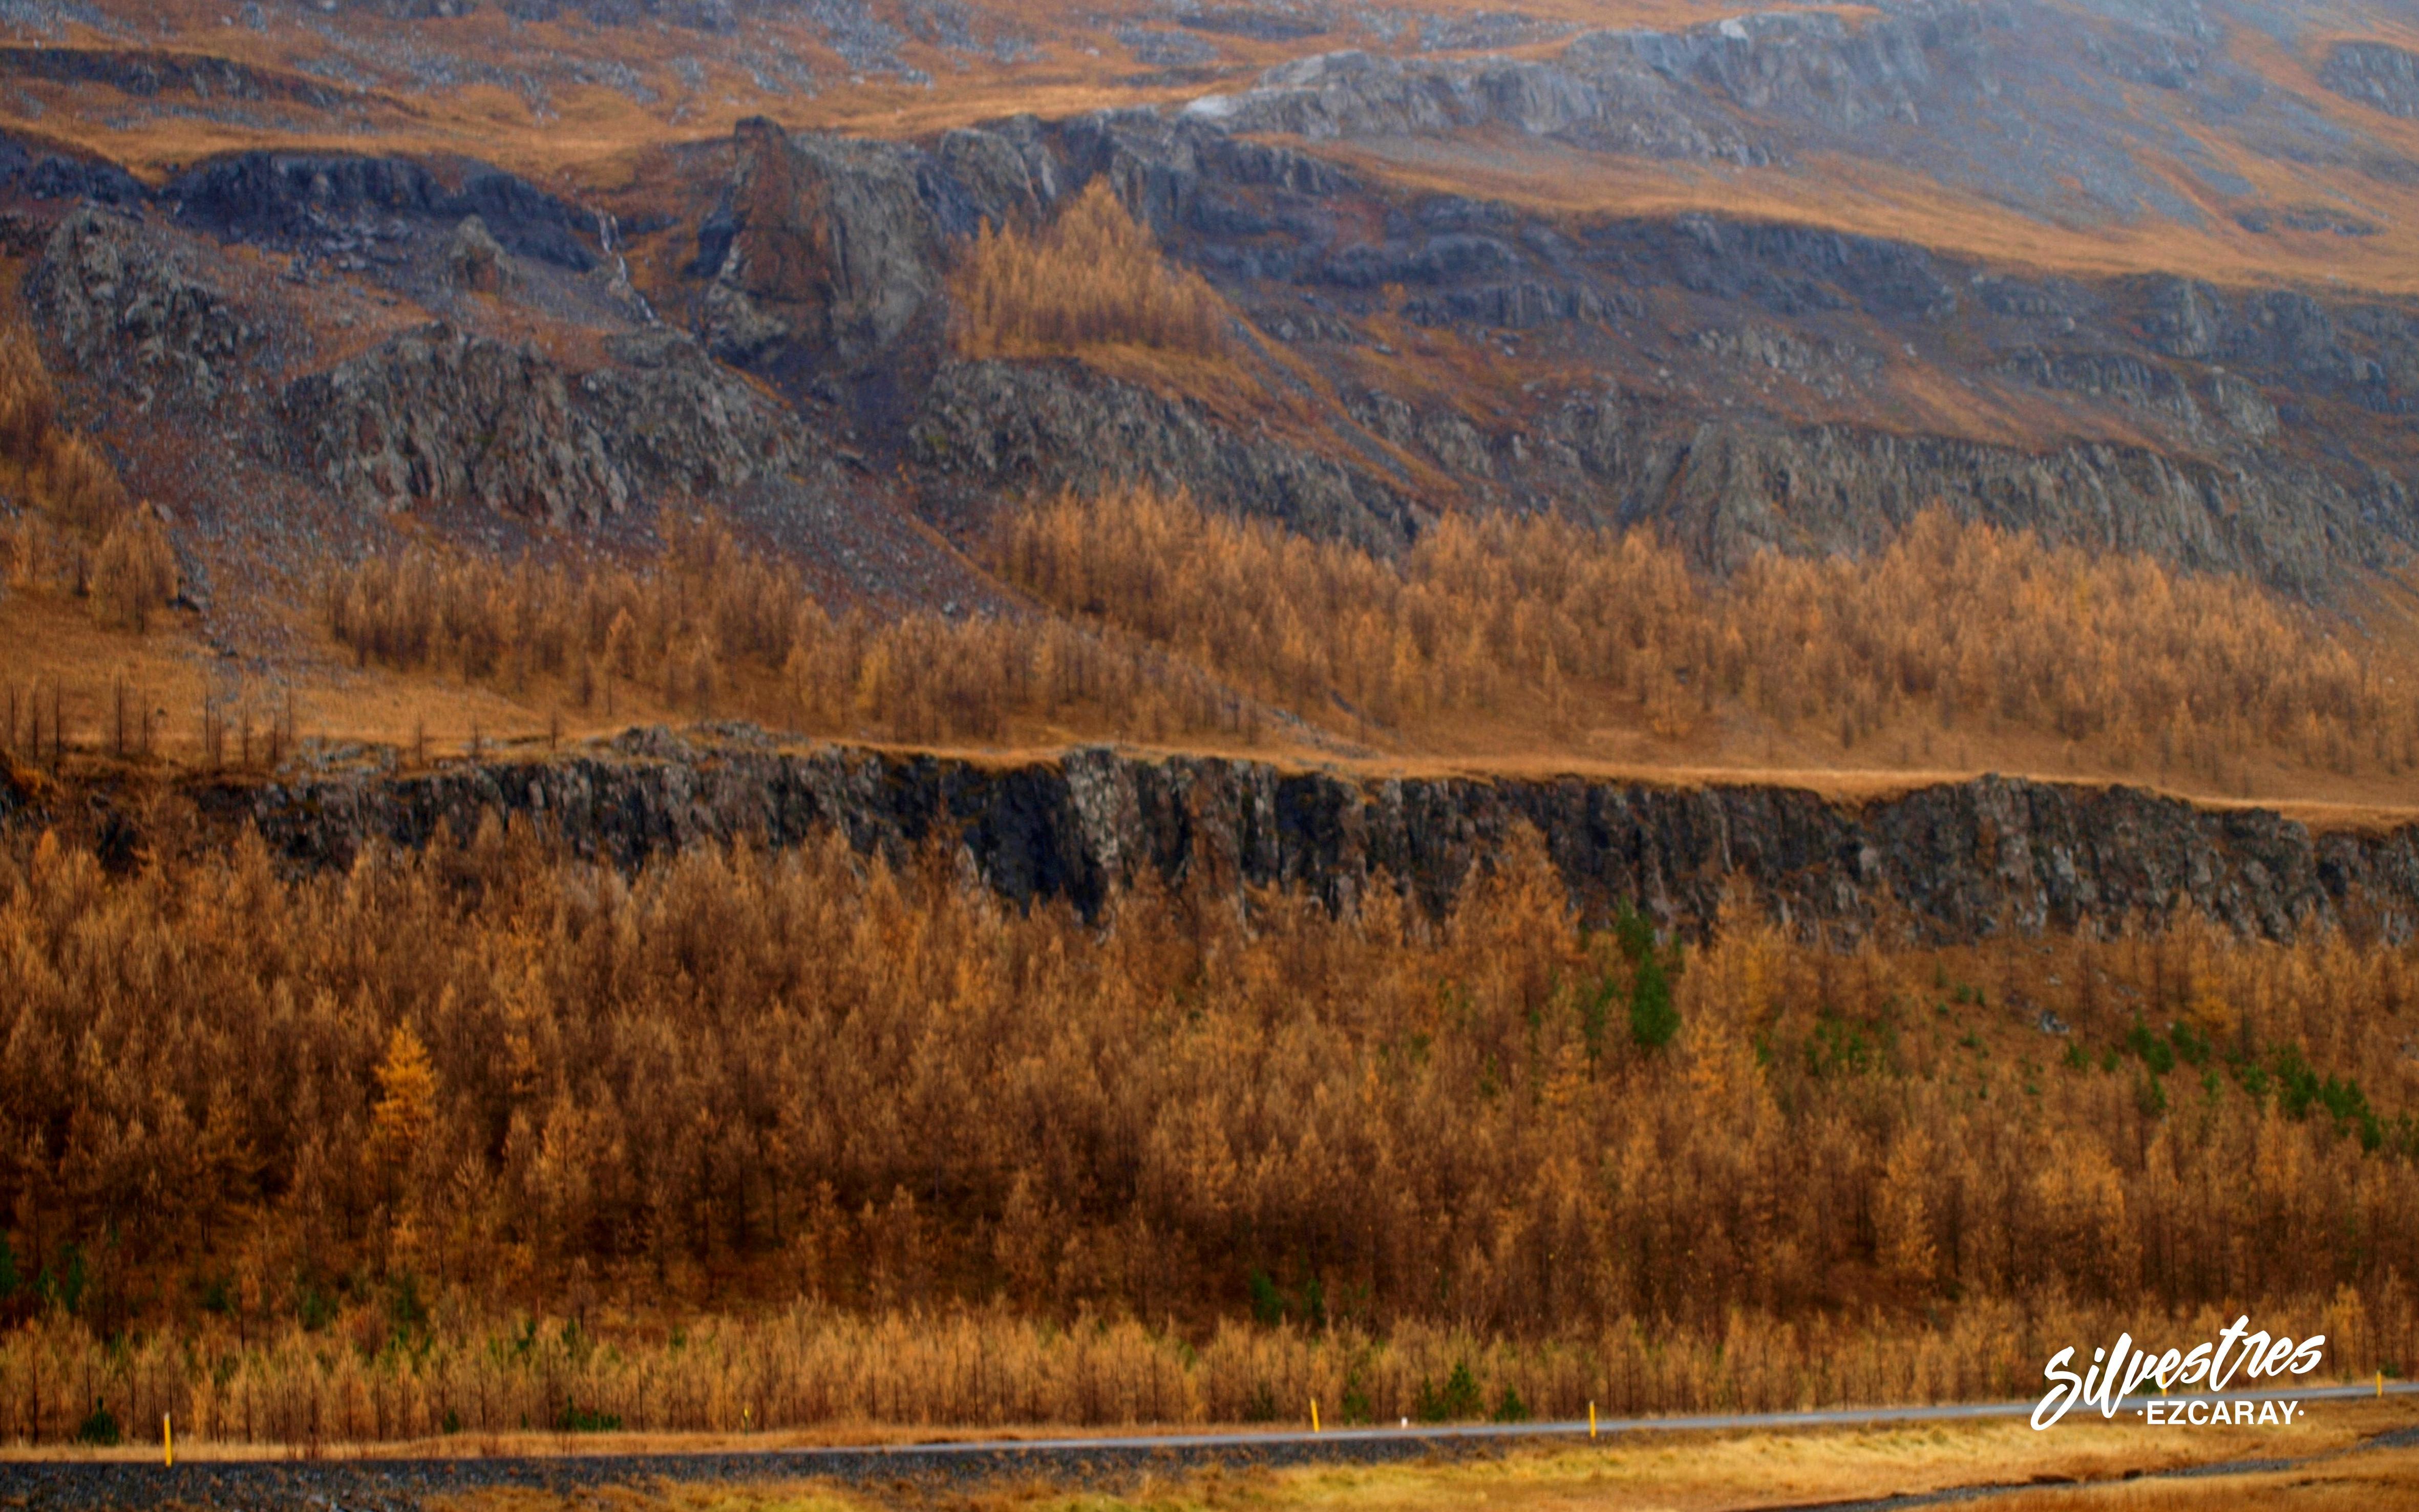 arboles_islandia_repoblaciones_plantaciones_forestales_alerce_larix_bosques